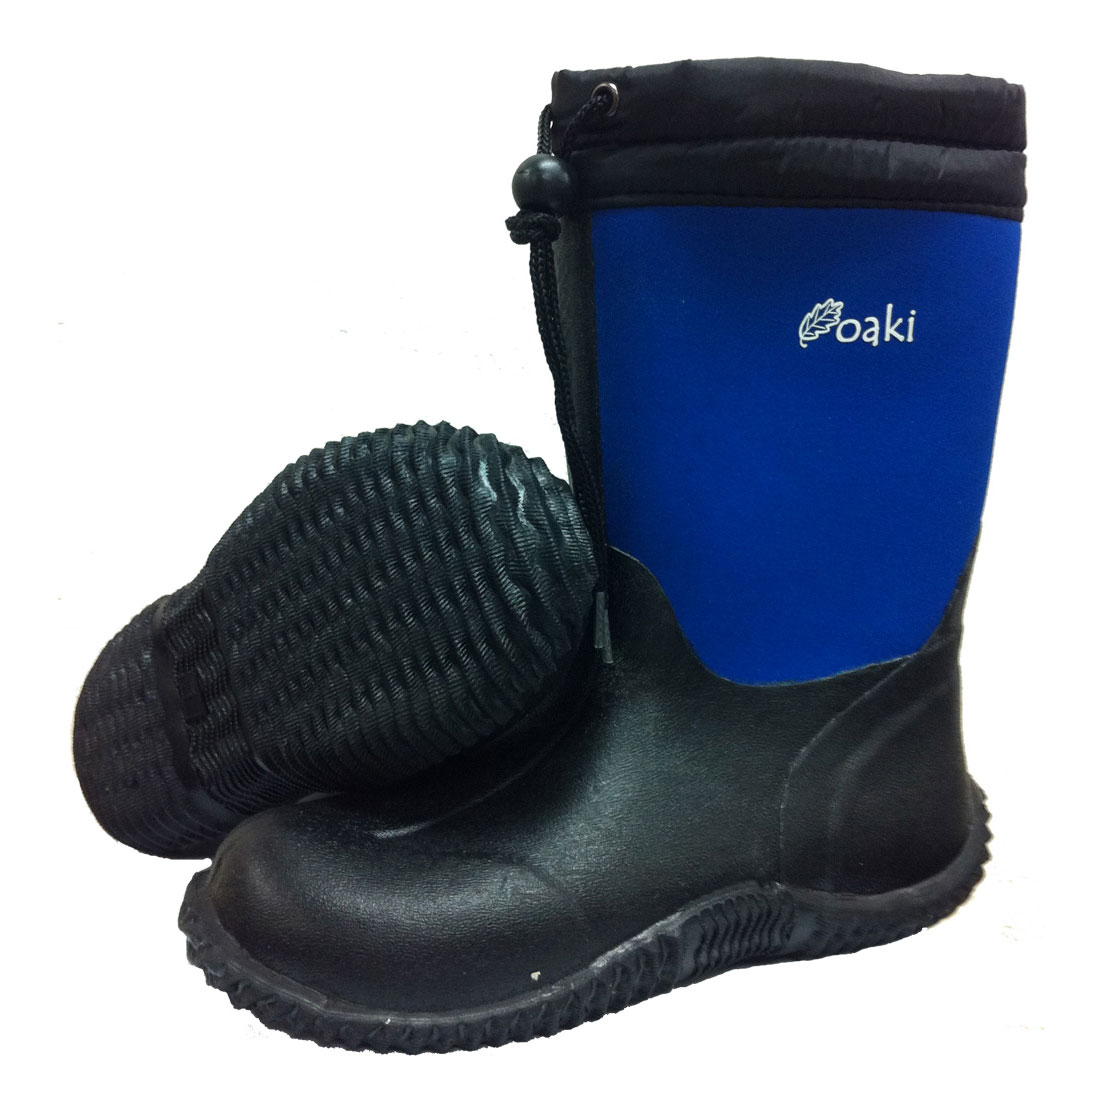 1102x1100 Blue Boots Cliparts